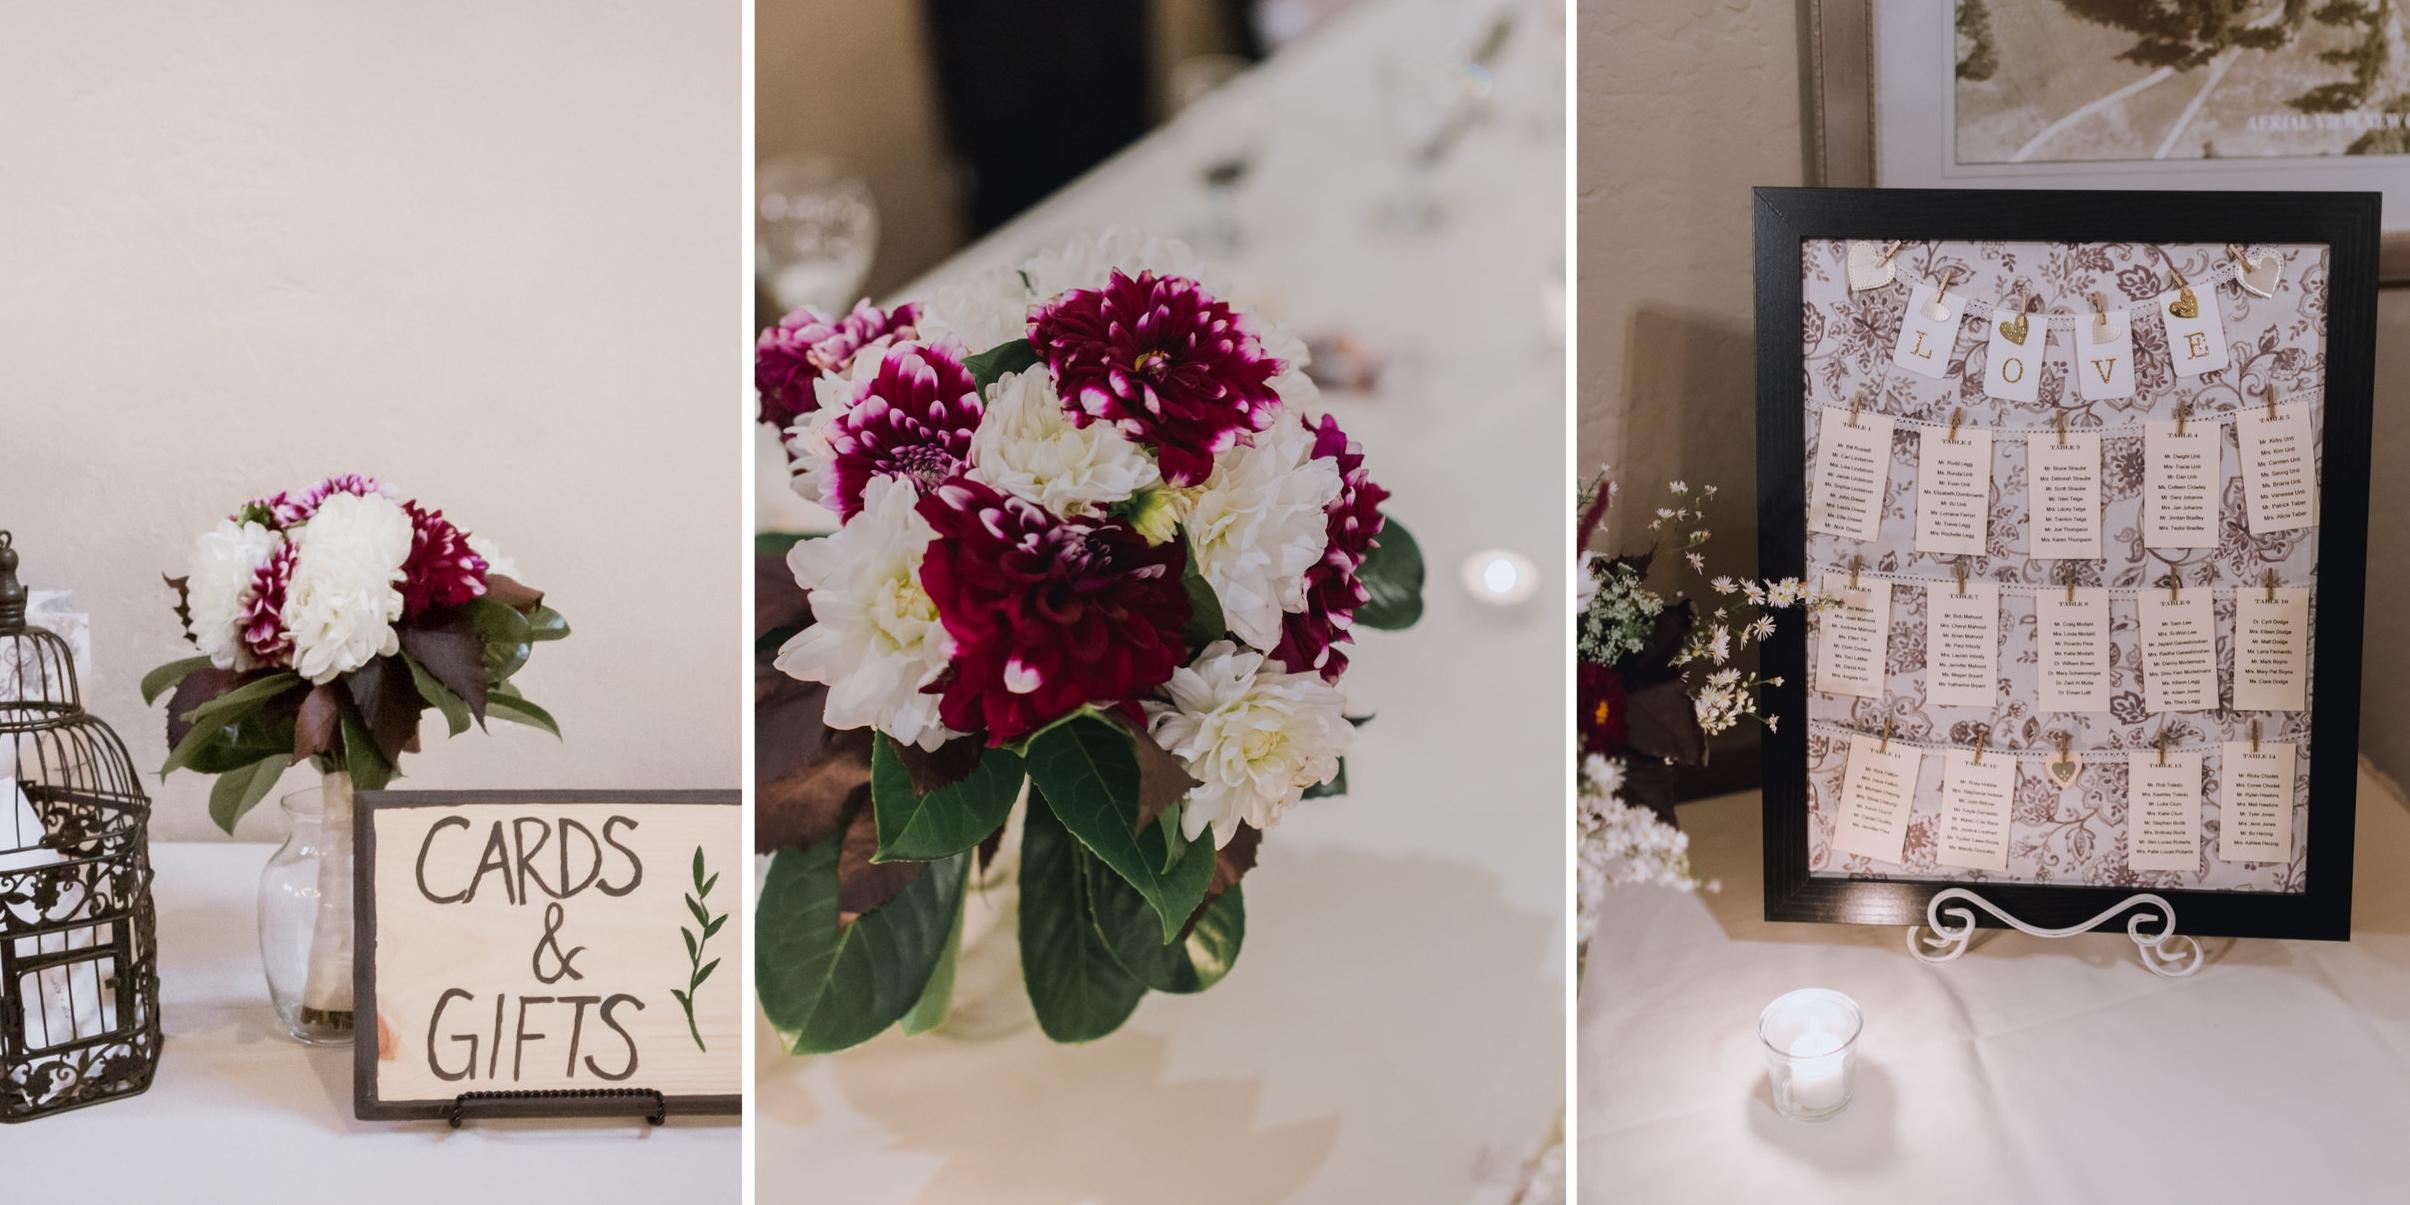 kristin-kevin-wedding-blog-4.jpg